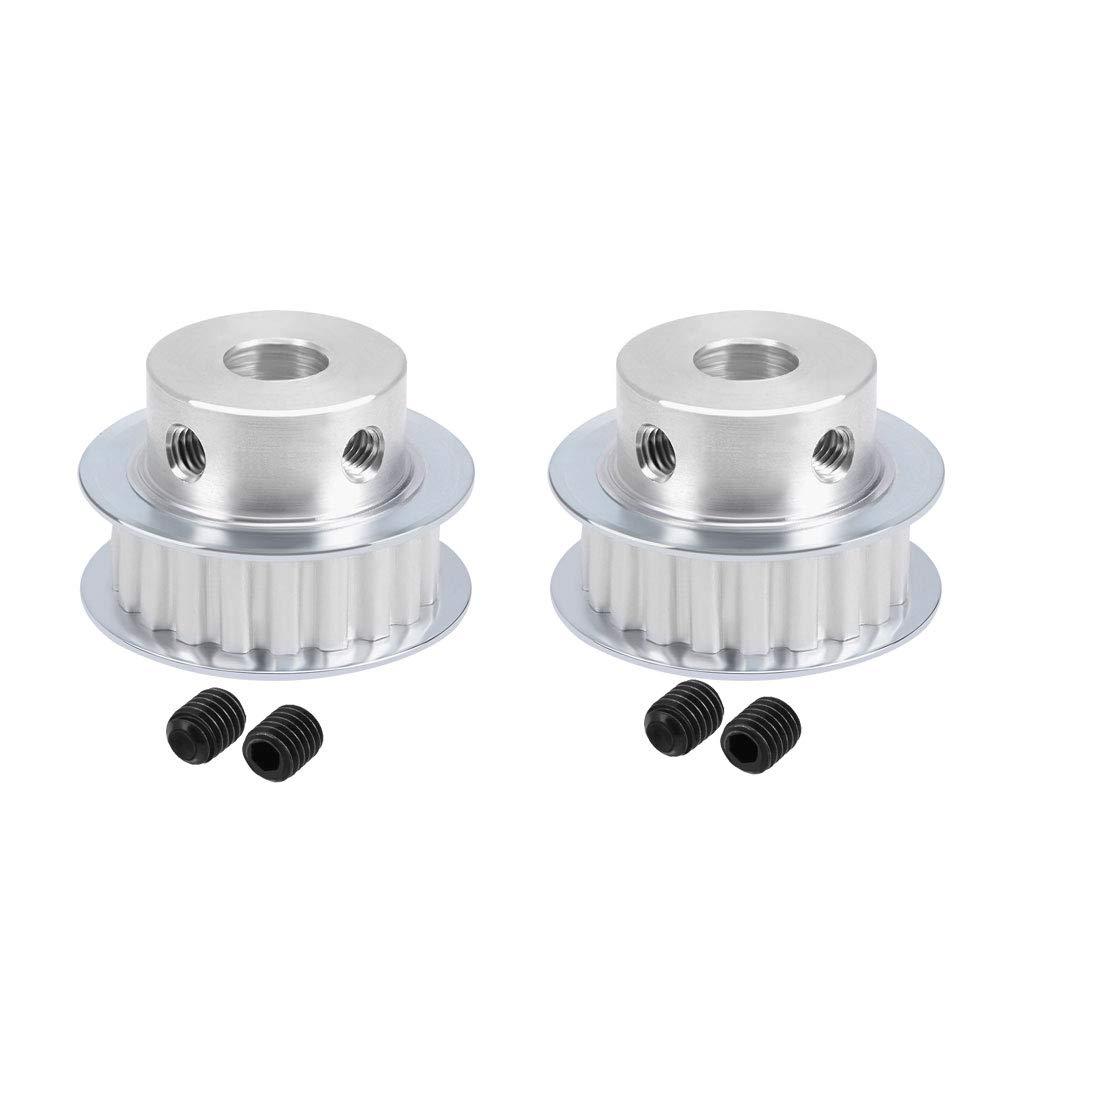 uxcell 2pcs Aluminum XL 20 Teeth 10mm Bore Timing Belt Pulley Flange Synchronous Wheel for 11mm Belt 3D Printer CNC